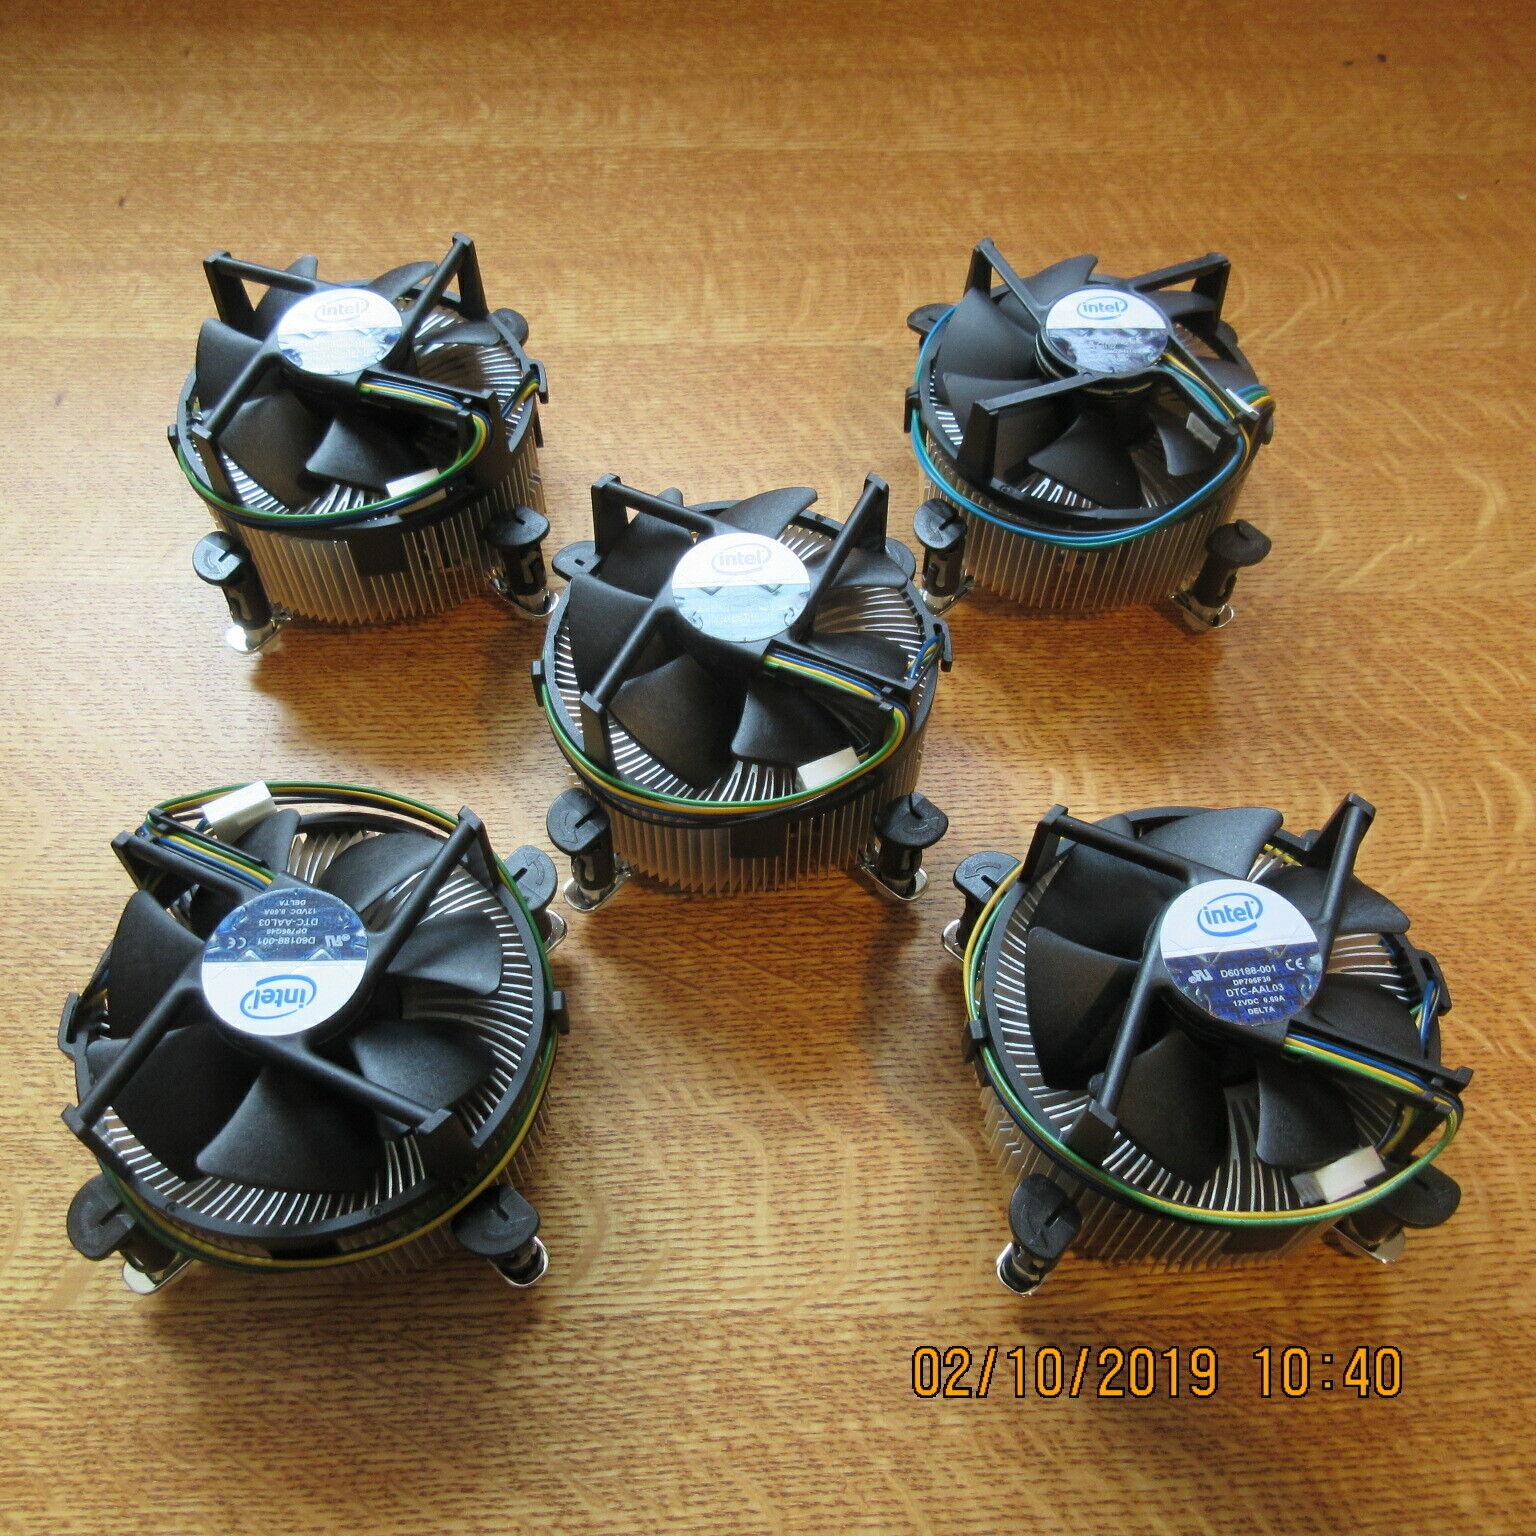 **NEW** Intel D60188-001 Socket LGA775 Copper Core CPU Heatsink and Fan Lot of 5